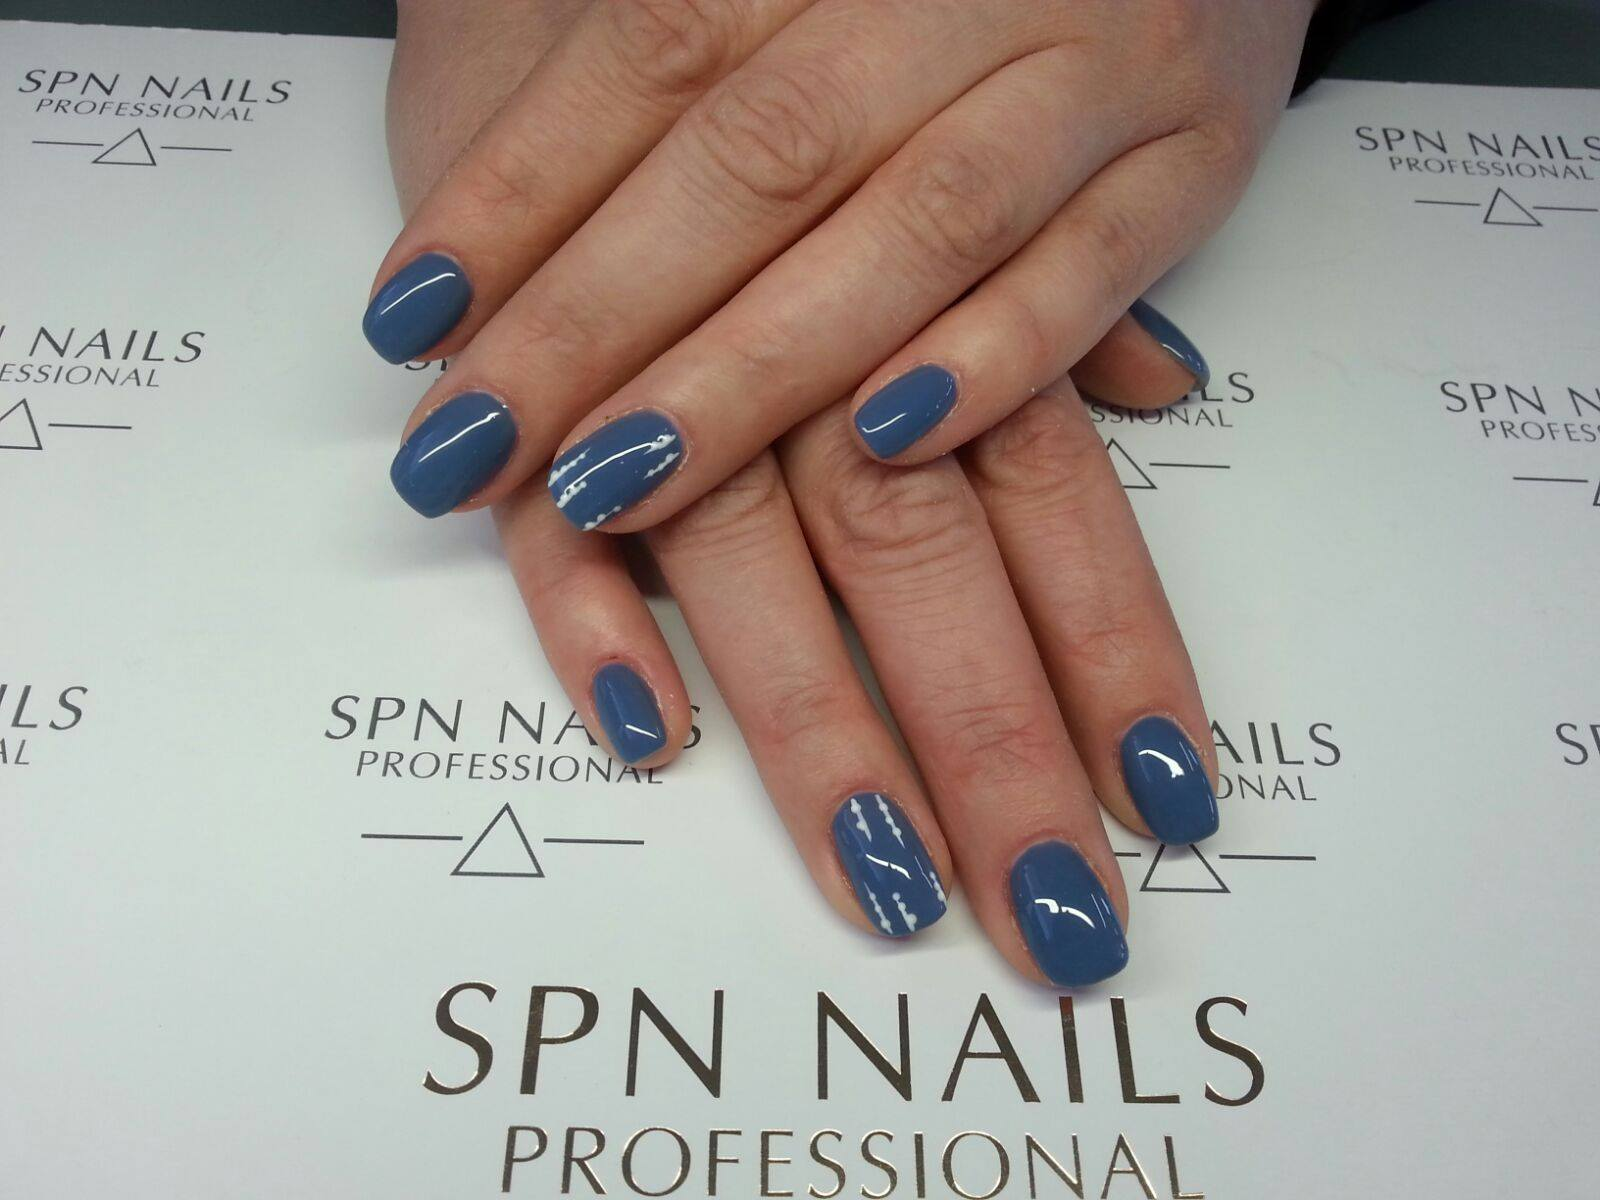 niebieski manicure